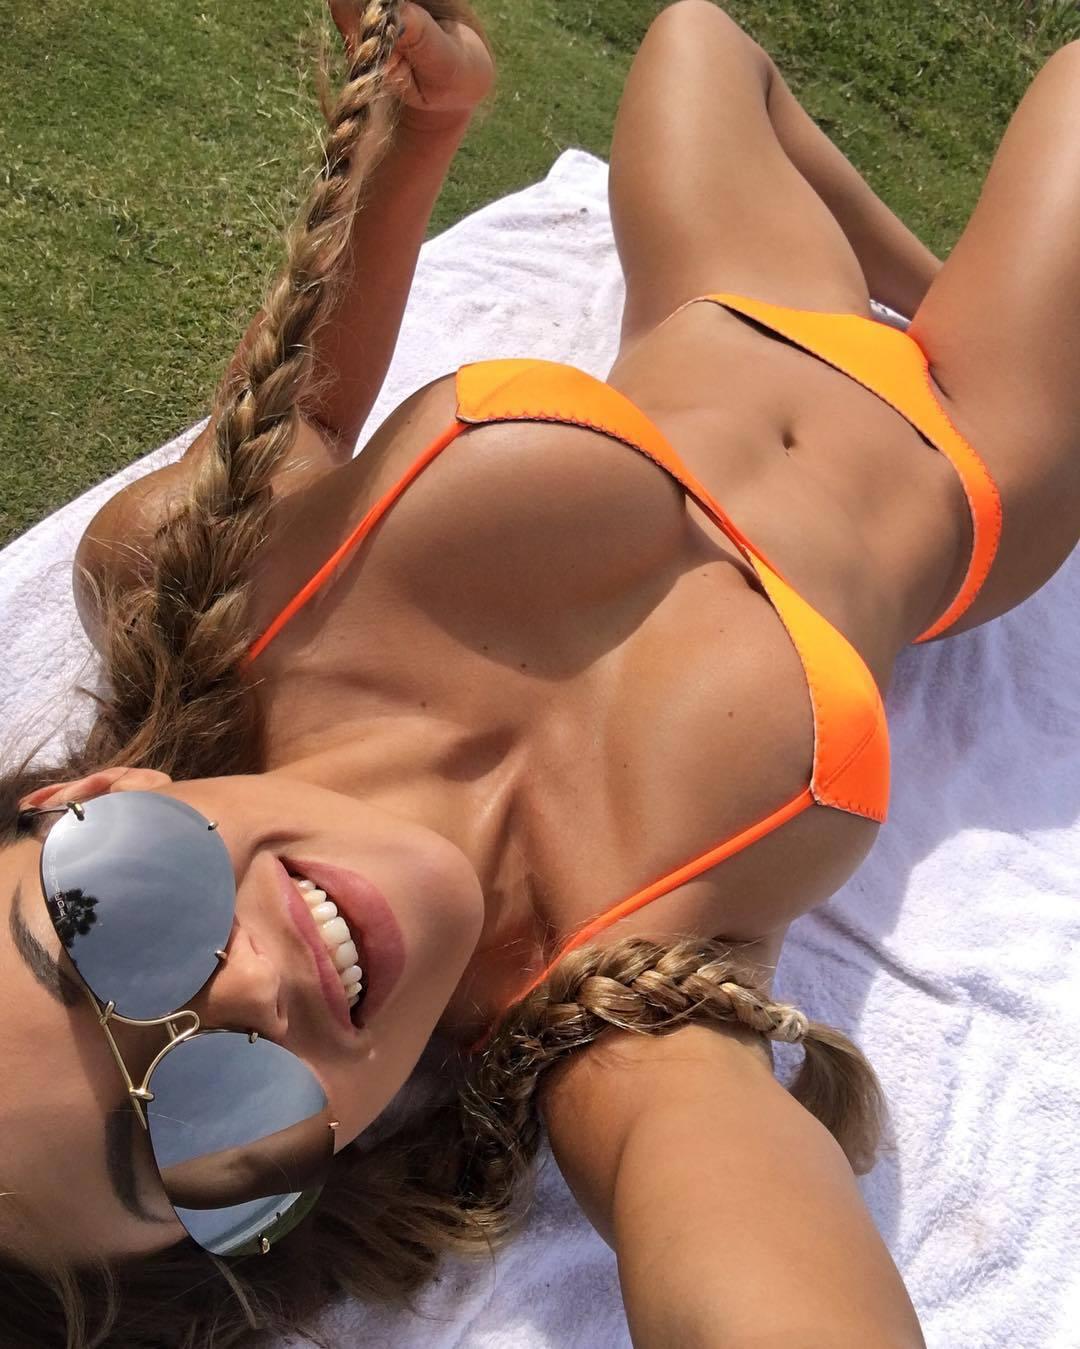 naked selfie boobs girl Busty